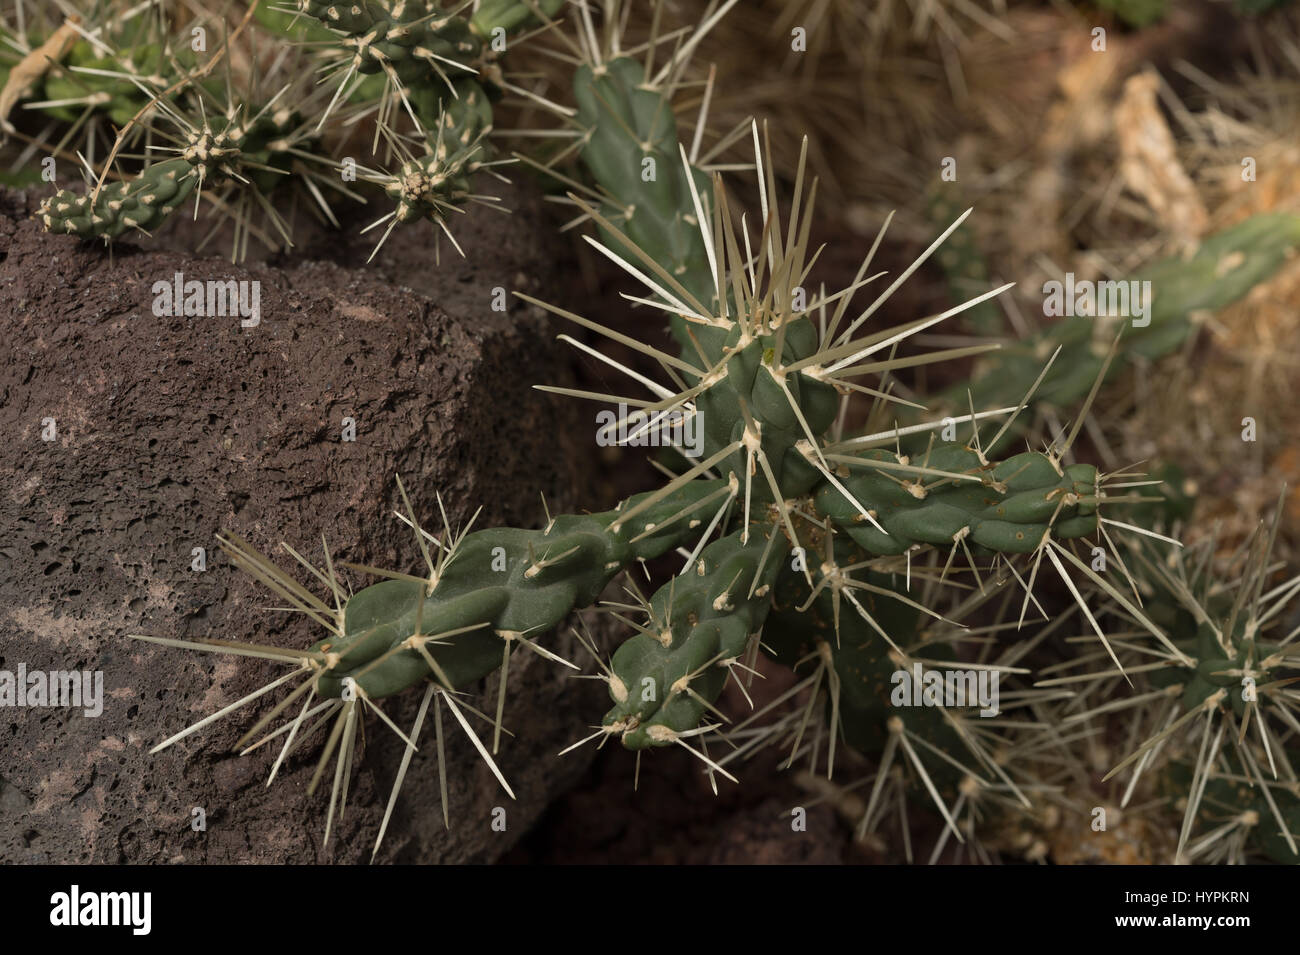 Silverspine Cane Cholla, Opuntia tunicata, Cactaceae, Mexico Stock Photo